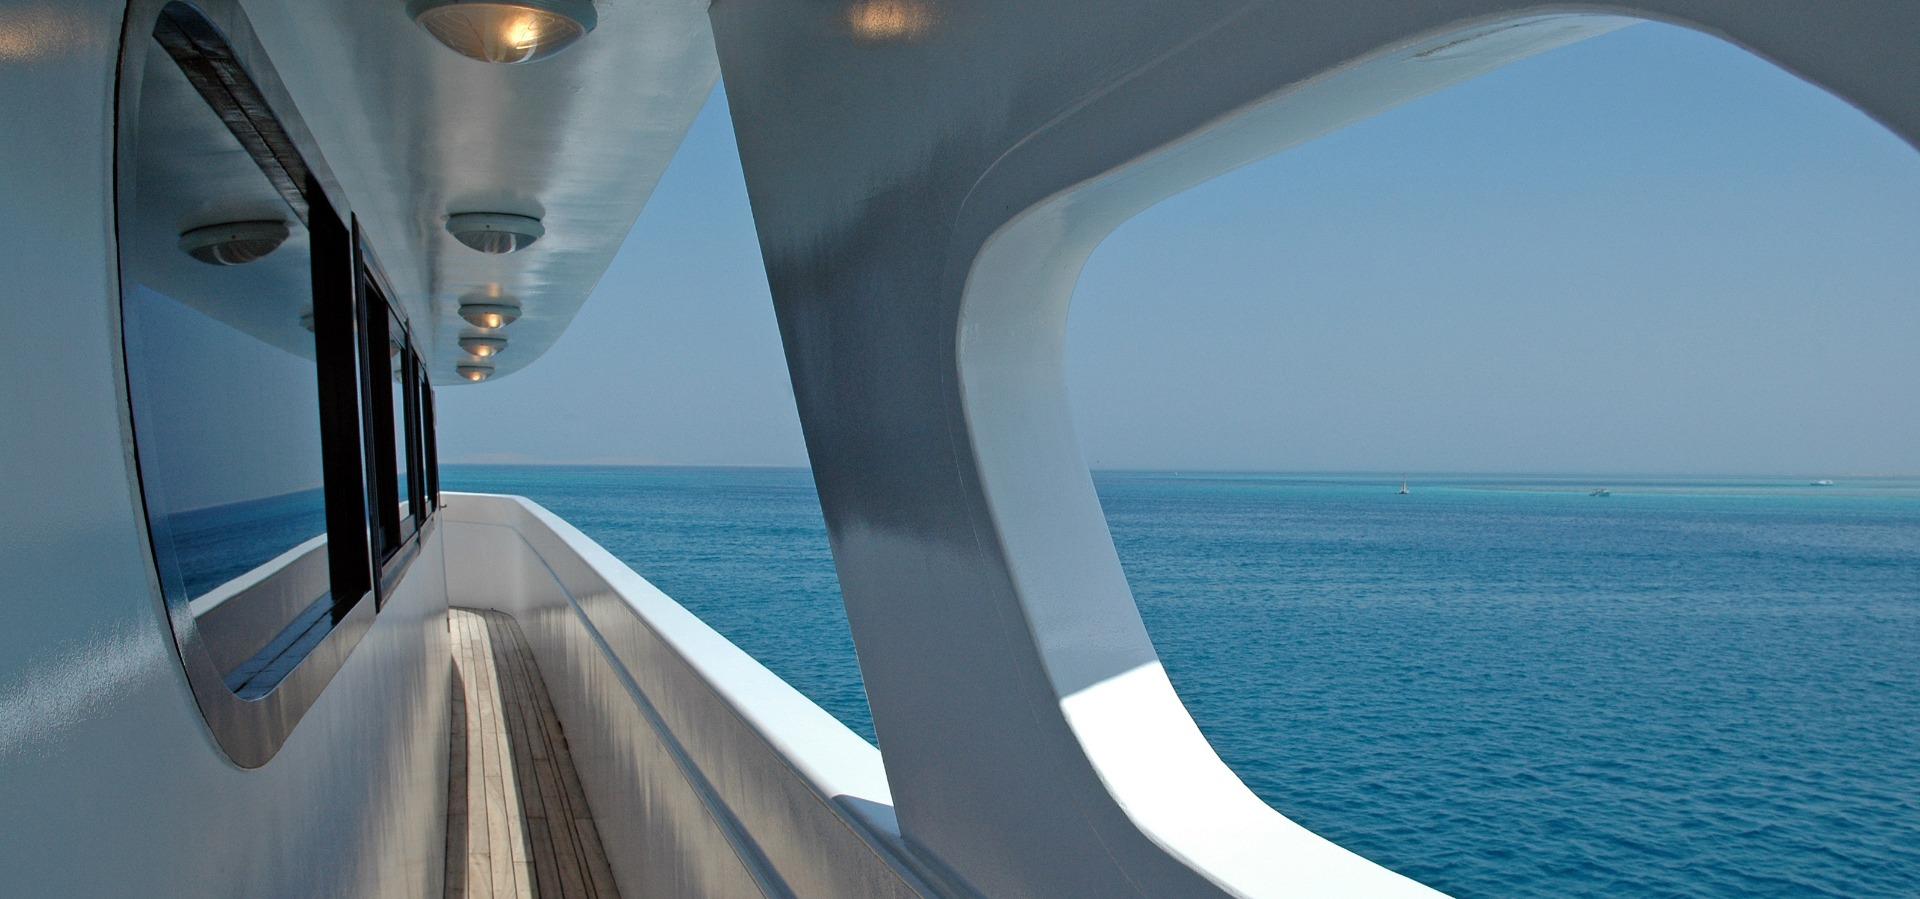 M/Y blue Horizon liveaboard diving starboard walkway